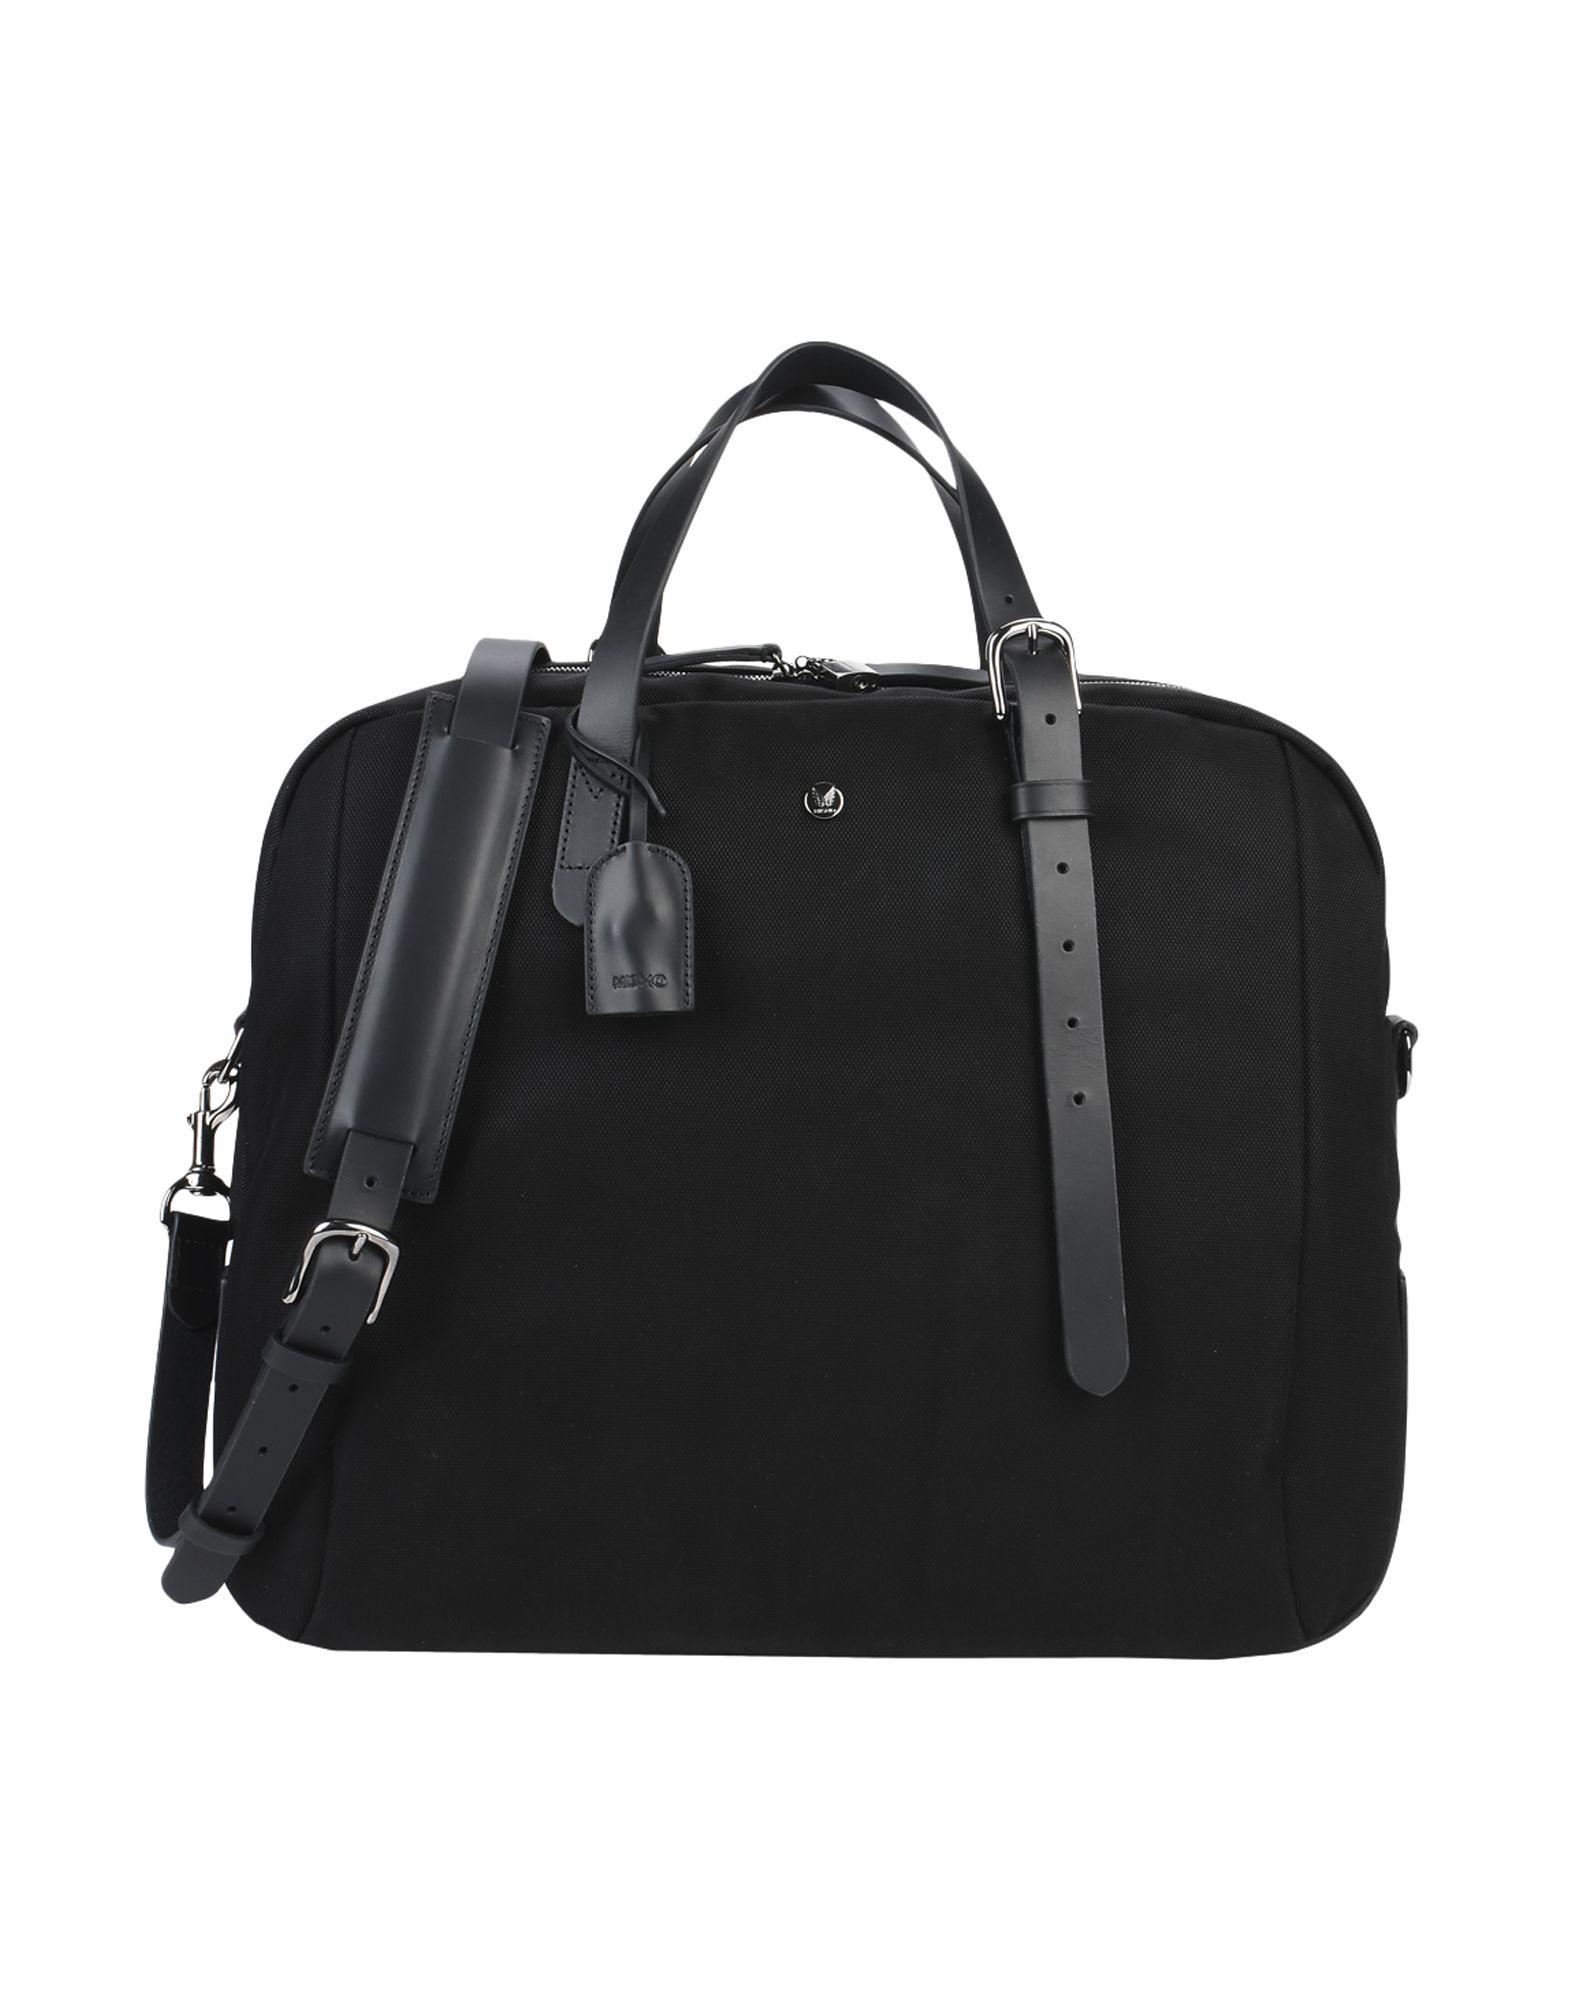 MISMO Travel & Duffel Bags in Black